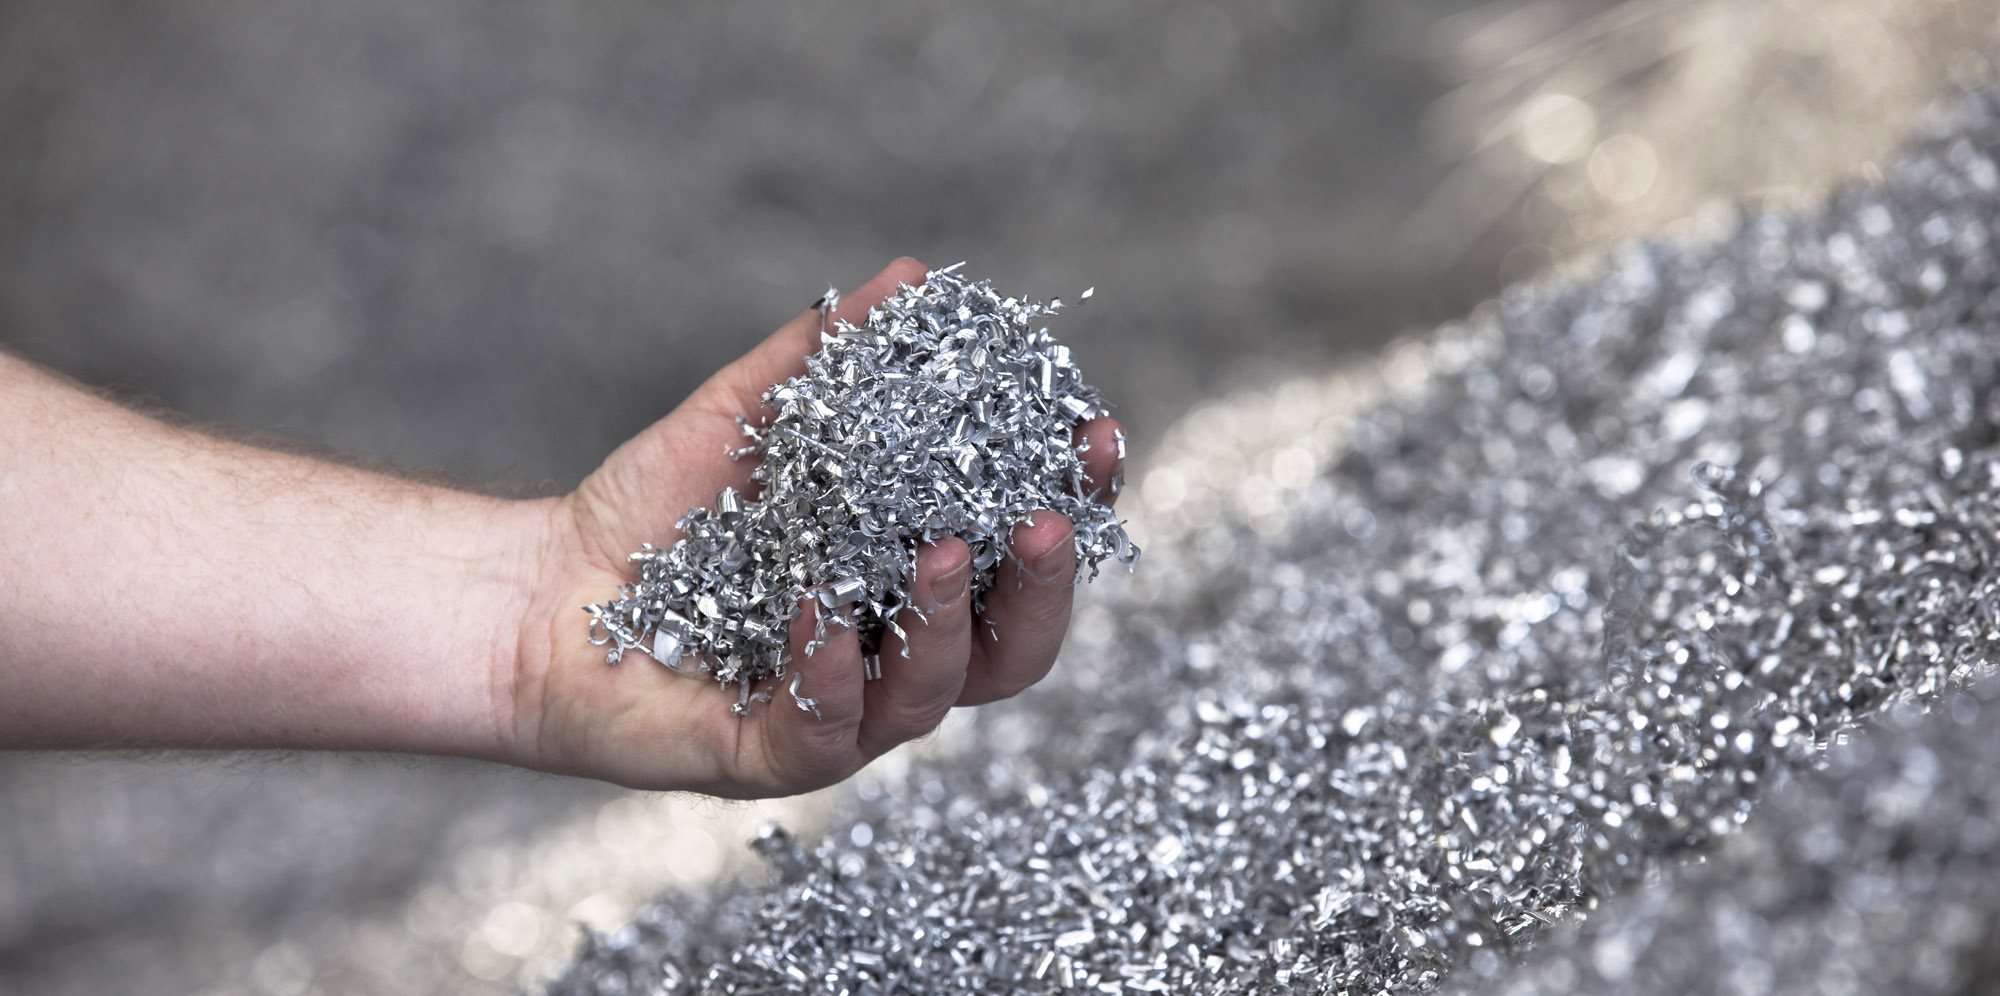 Industry fabrication equipment for ferrous and non-ferrous metallurgy